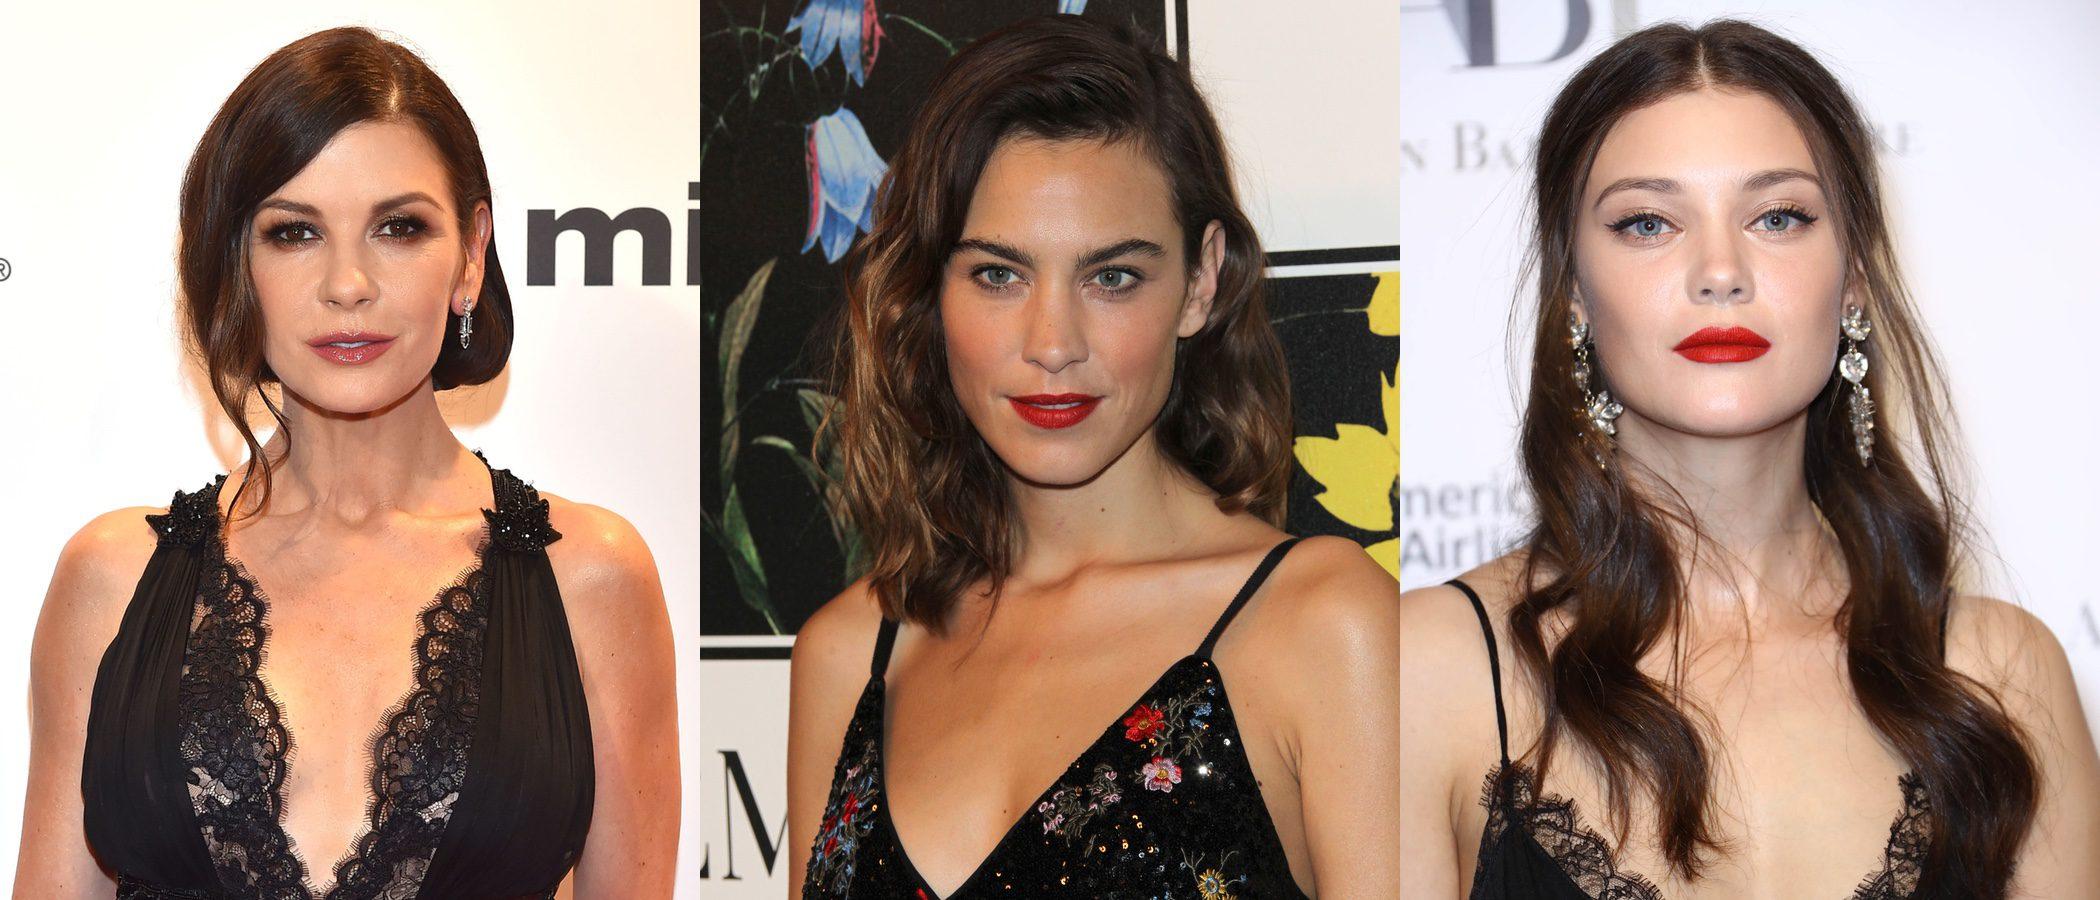 Catherine Zeta Jones, Alexa Chung y Diana Moldovan luces los mejores beauty looks de esta semana